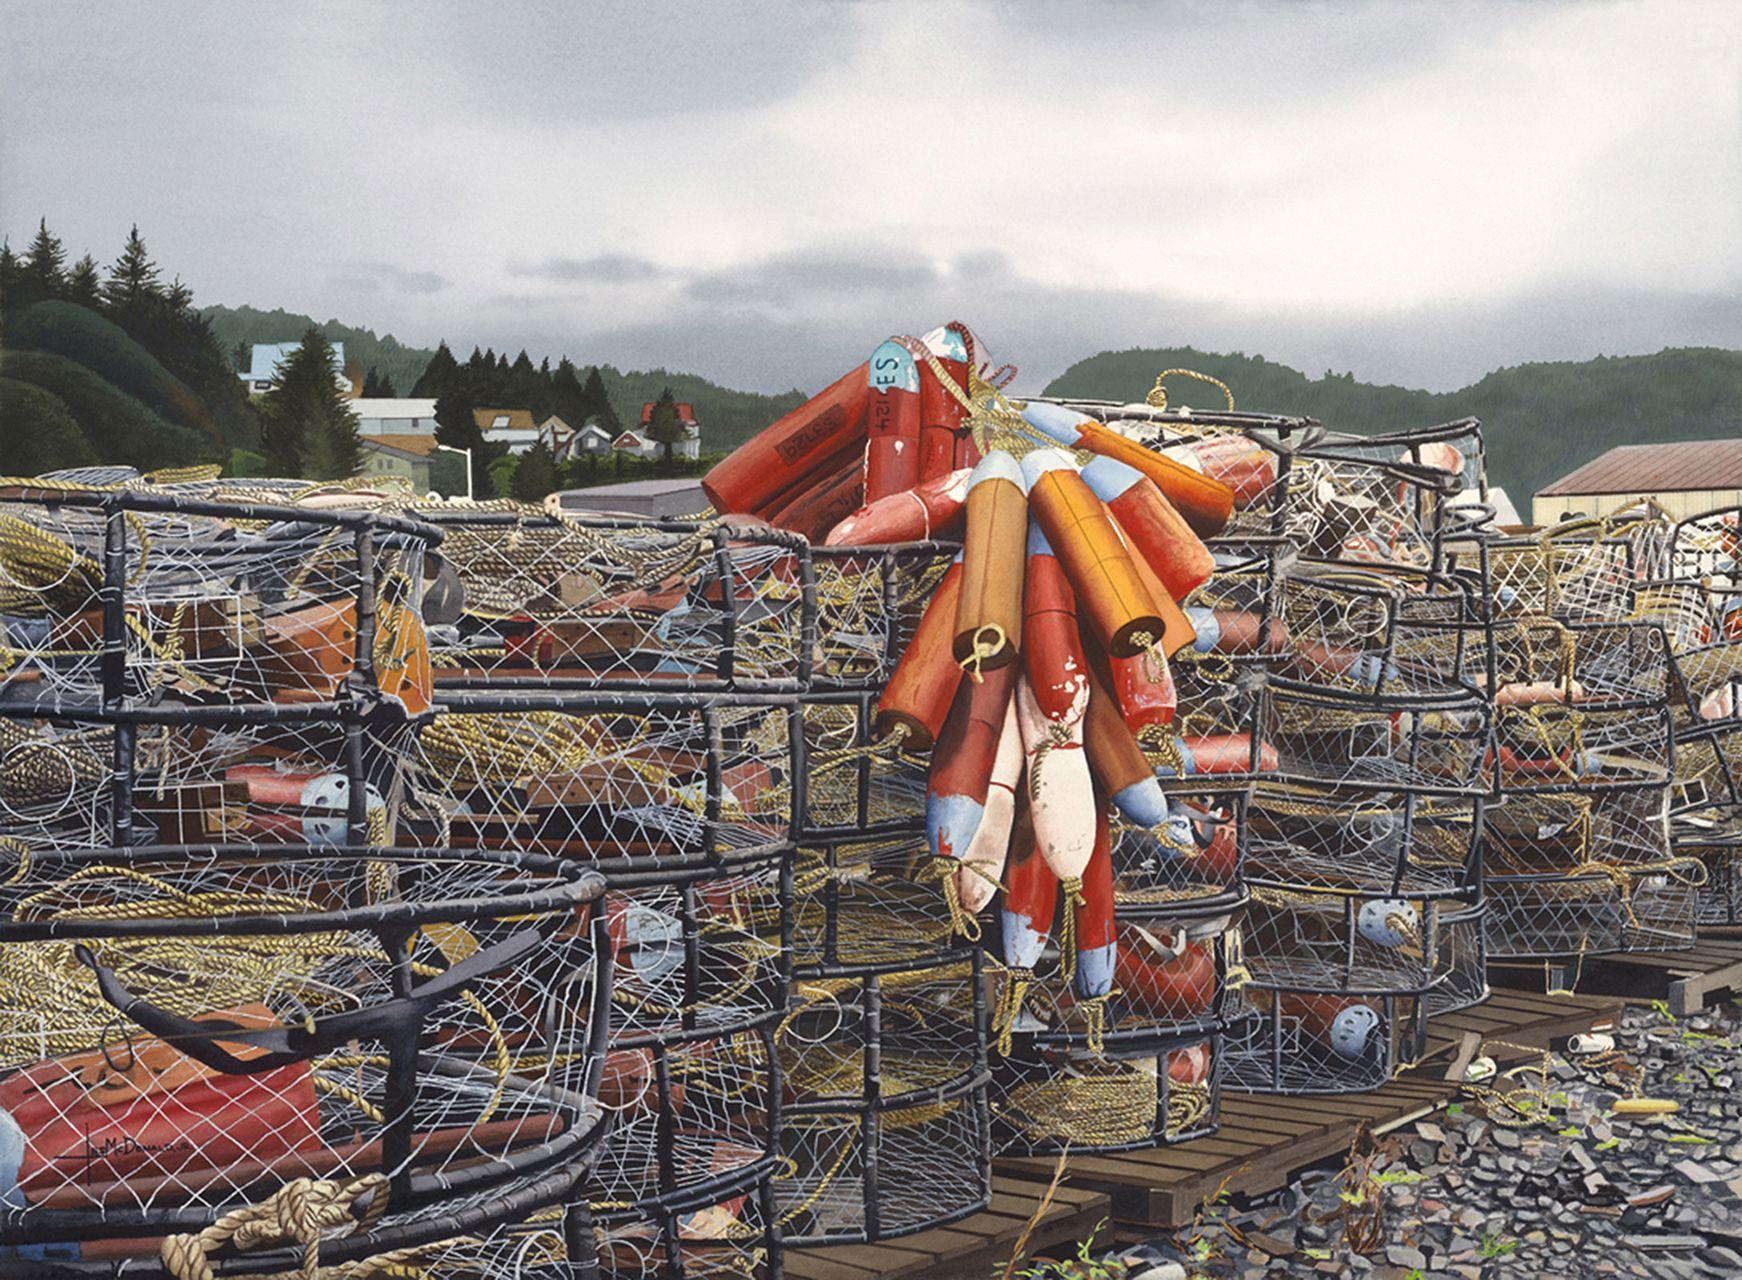 Alaska Crab Traps, Painting, Watercolor on Watercolor Paper